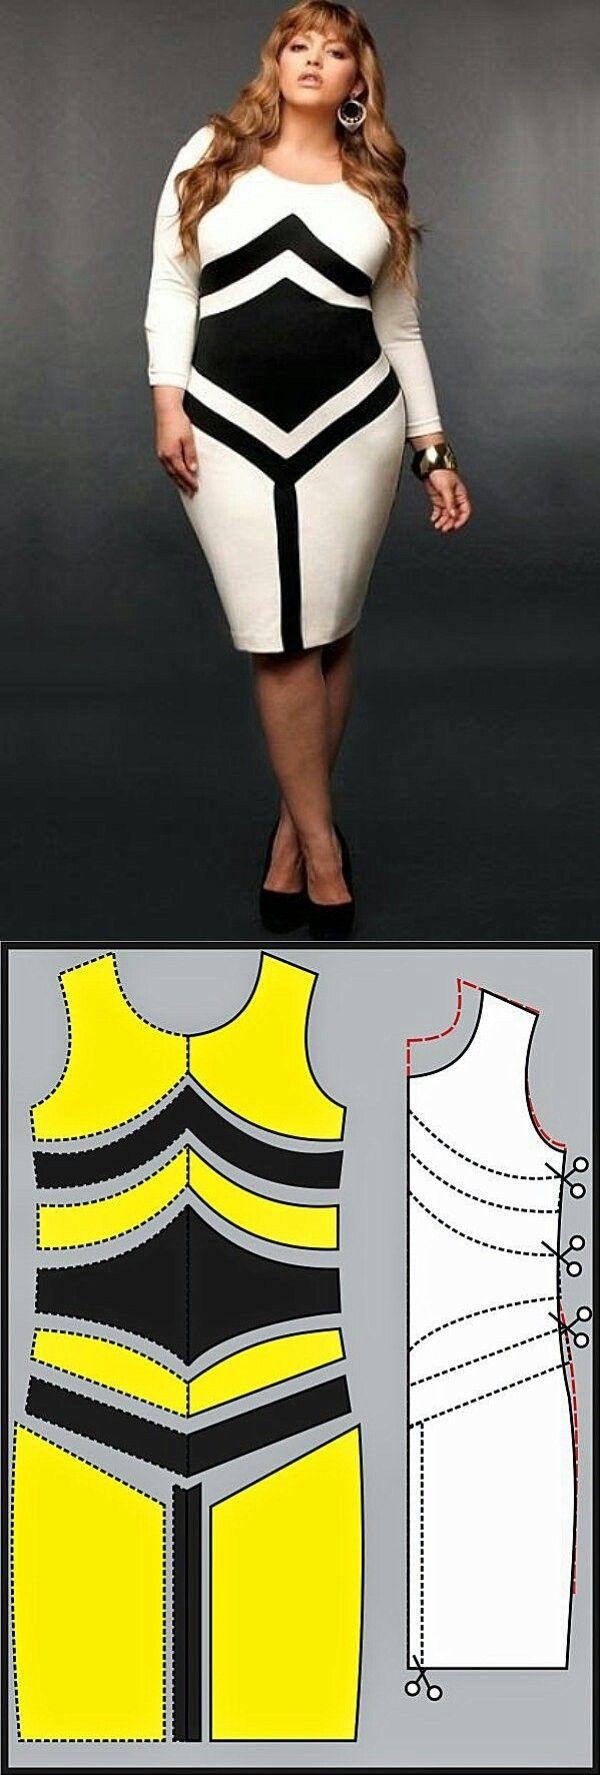 Lovely stripped block pattern dress